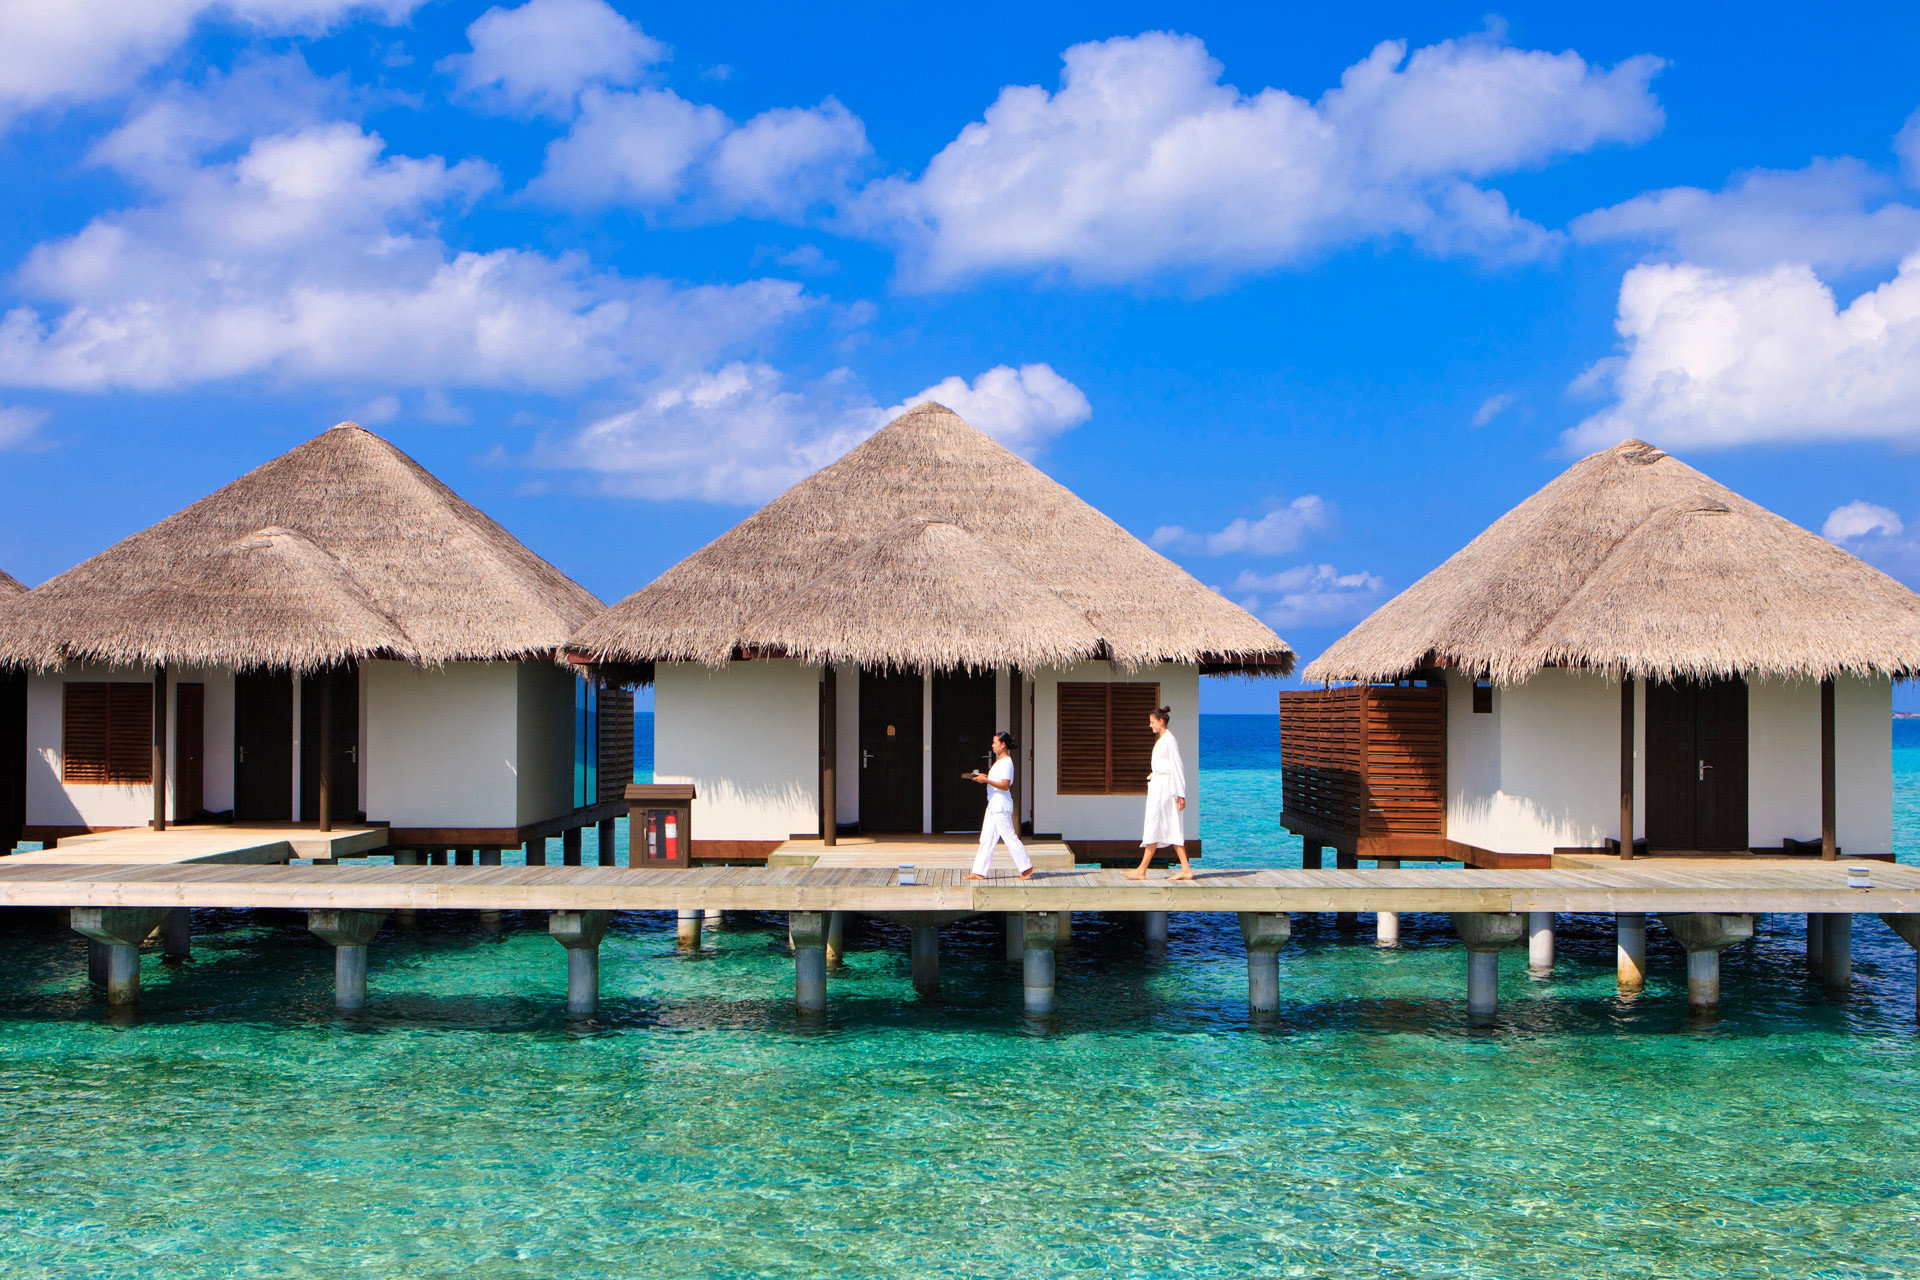 Hotels Romance Trip Ideas building sky house water swimming pool property Resort Villa home Sea hut Lagoon cottage caribbean swimming Island